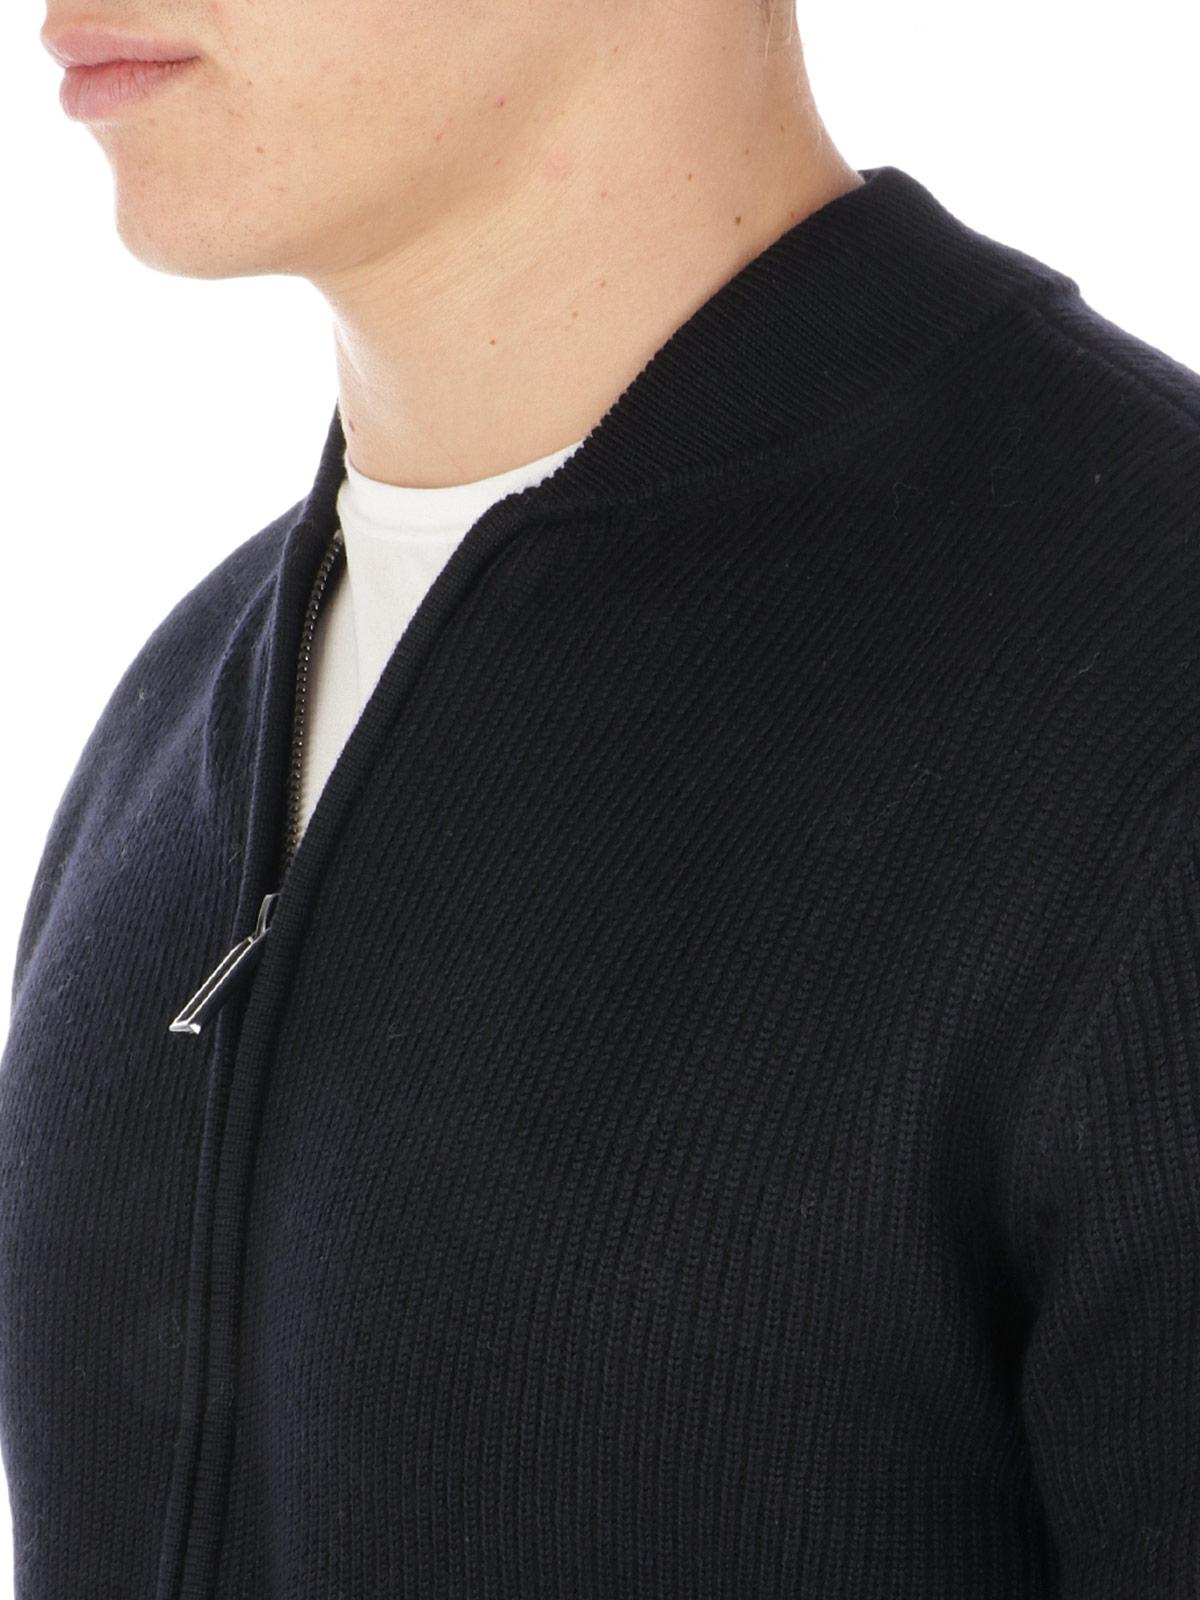 Picture of EMPORIO ARMANI   Men's Virgin Wool Cardigan